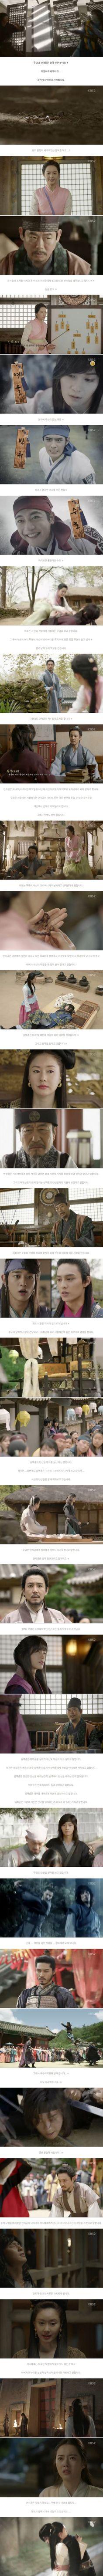 Added episode 3 captures for the Korean drama 'Hwarang'.